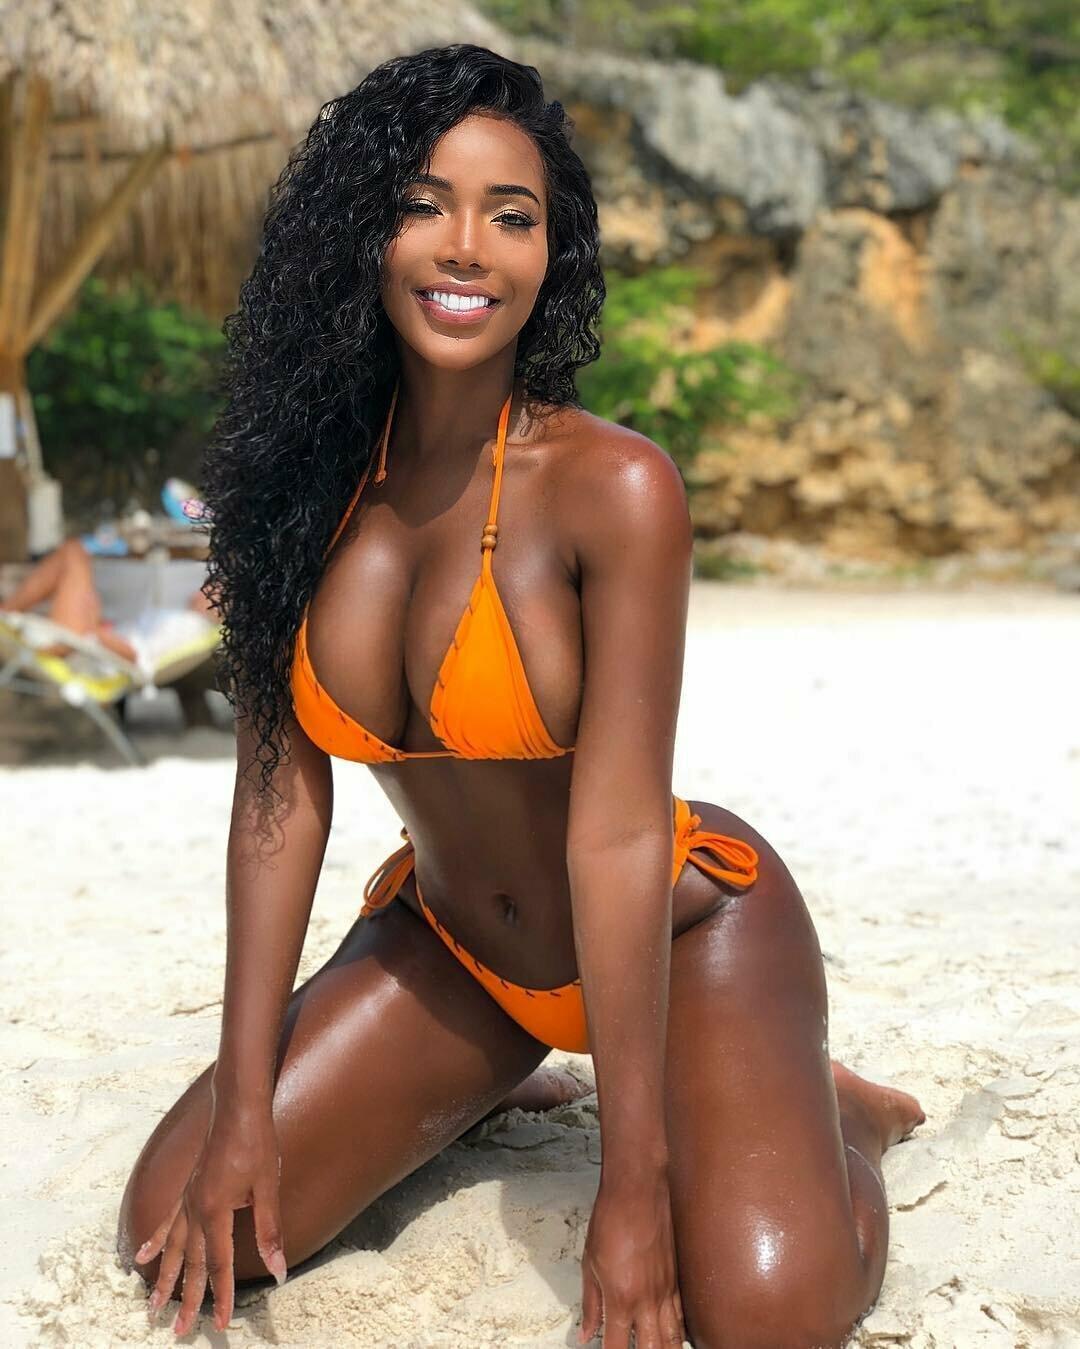 Black women camporn